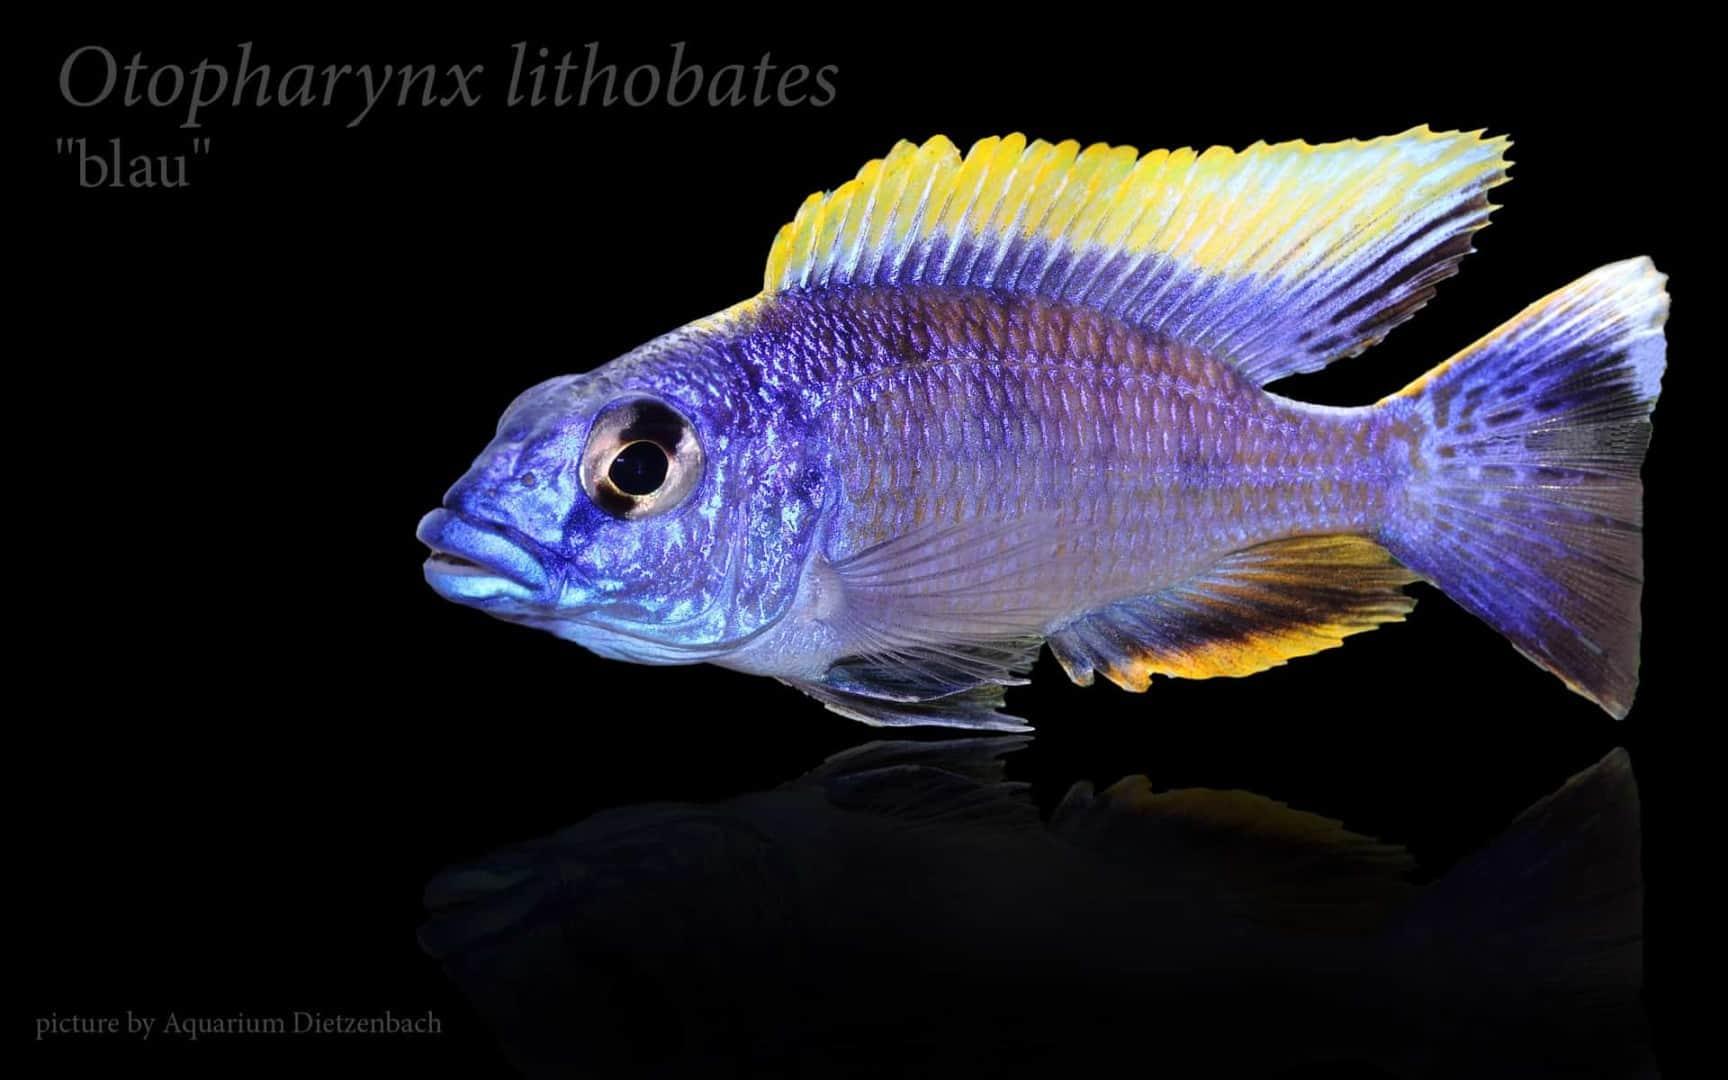 Otopharynx lithobates 7